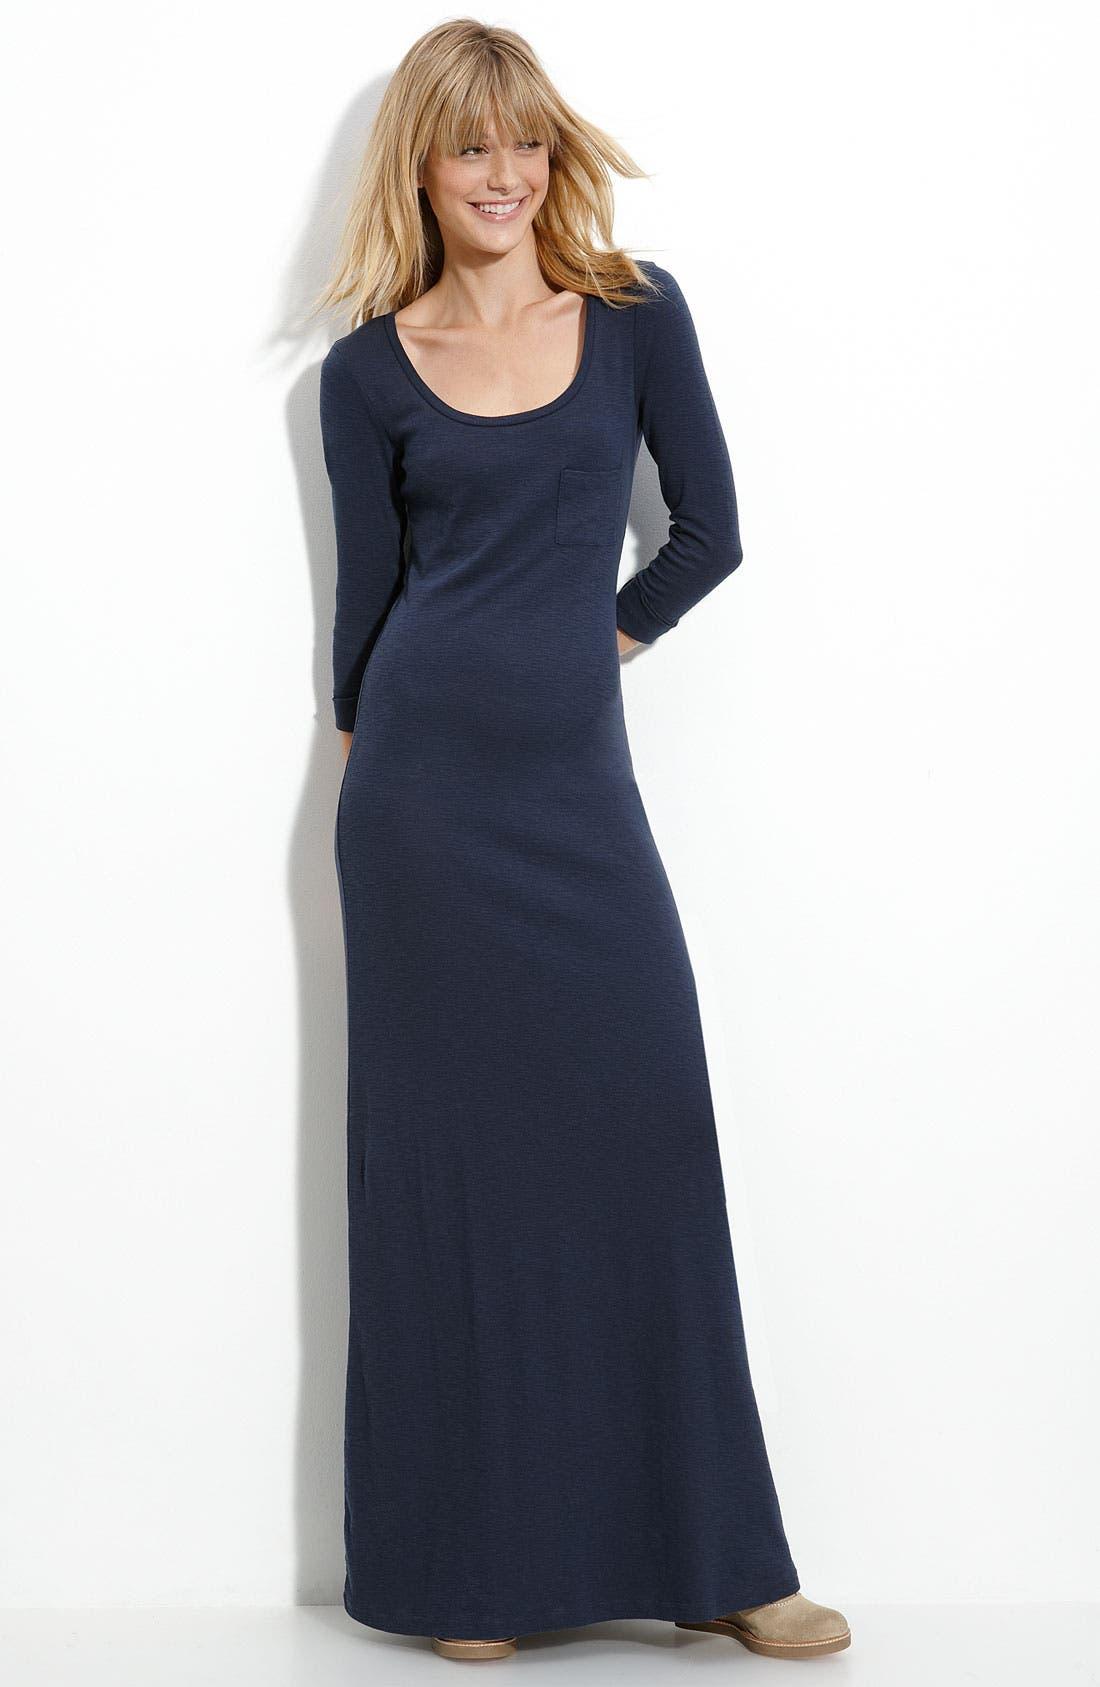 Alternate Image 1 Selected - Frenchi® Slub Knit Maxi Dress (Juniors)